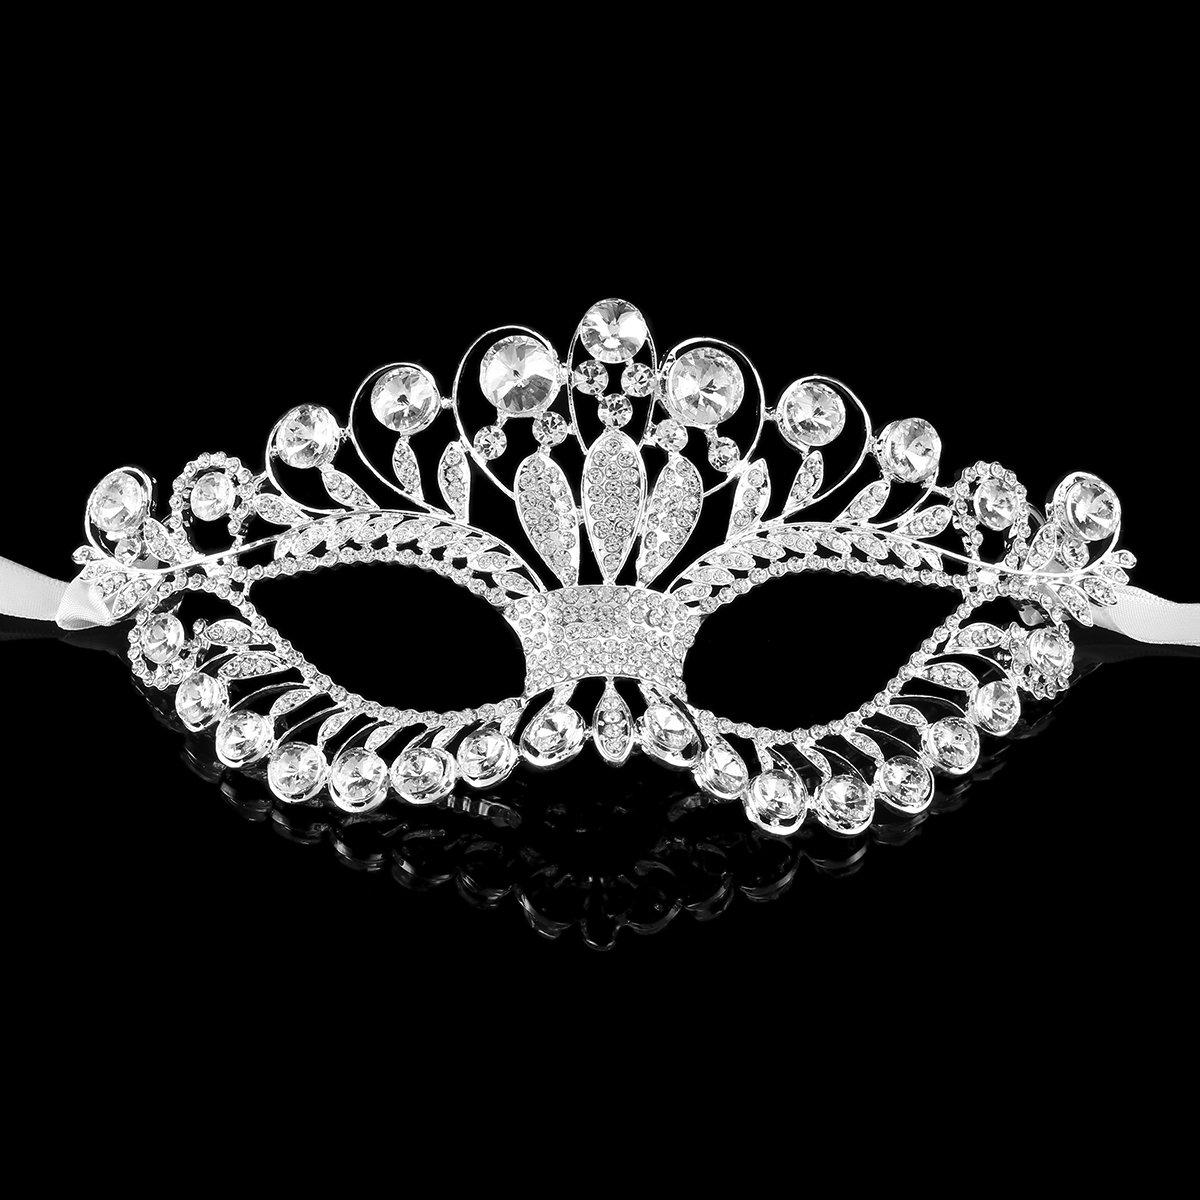 Stuffwholesale Party Dance Silver Mask Crystal Rhinestone Masquerade Eyemask (#5)